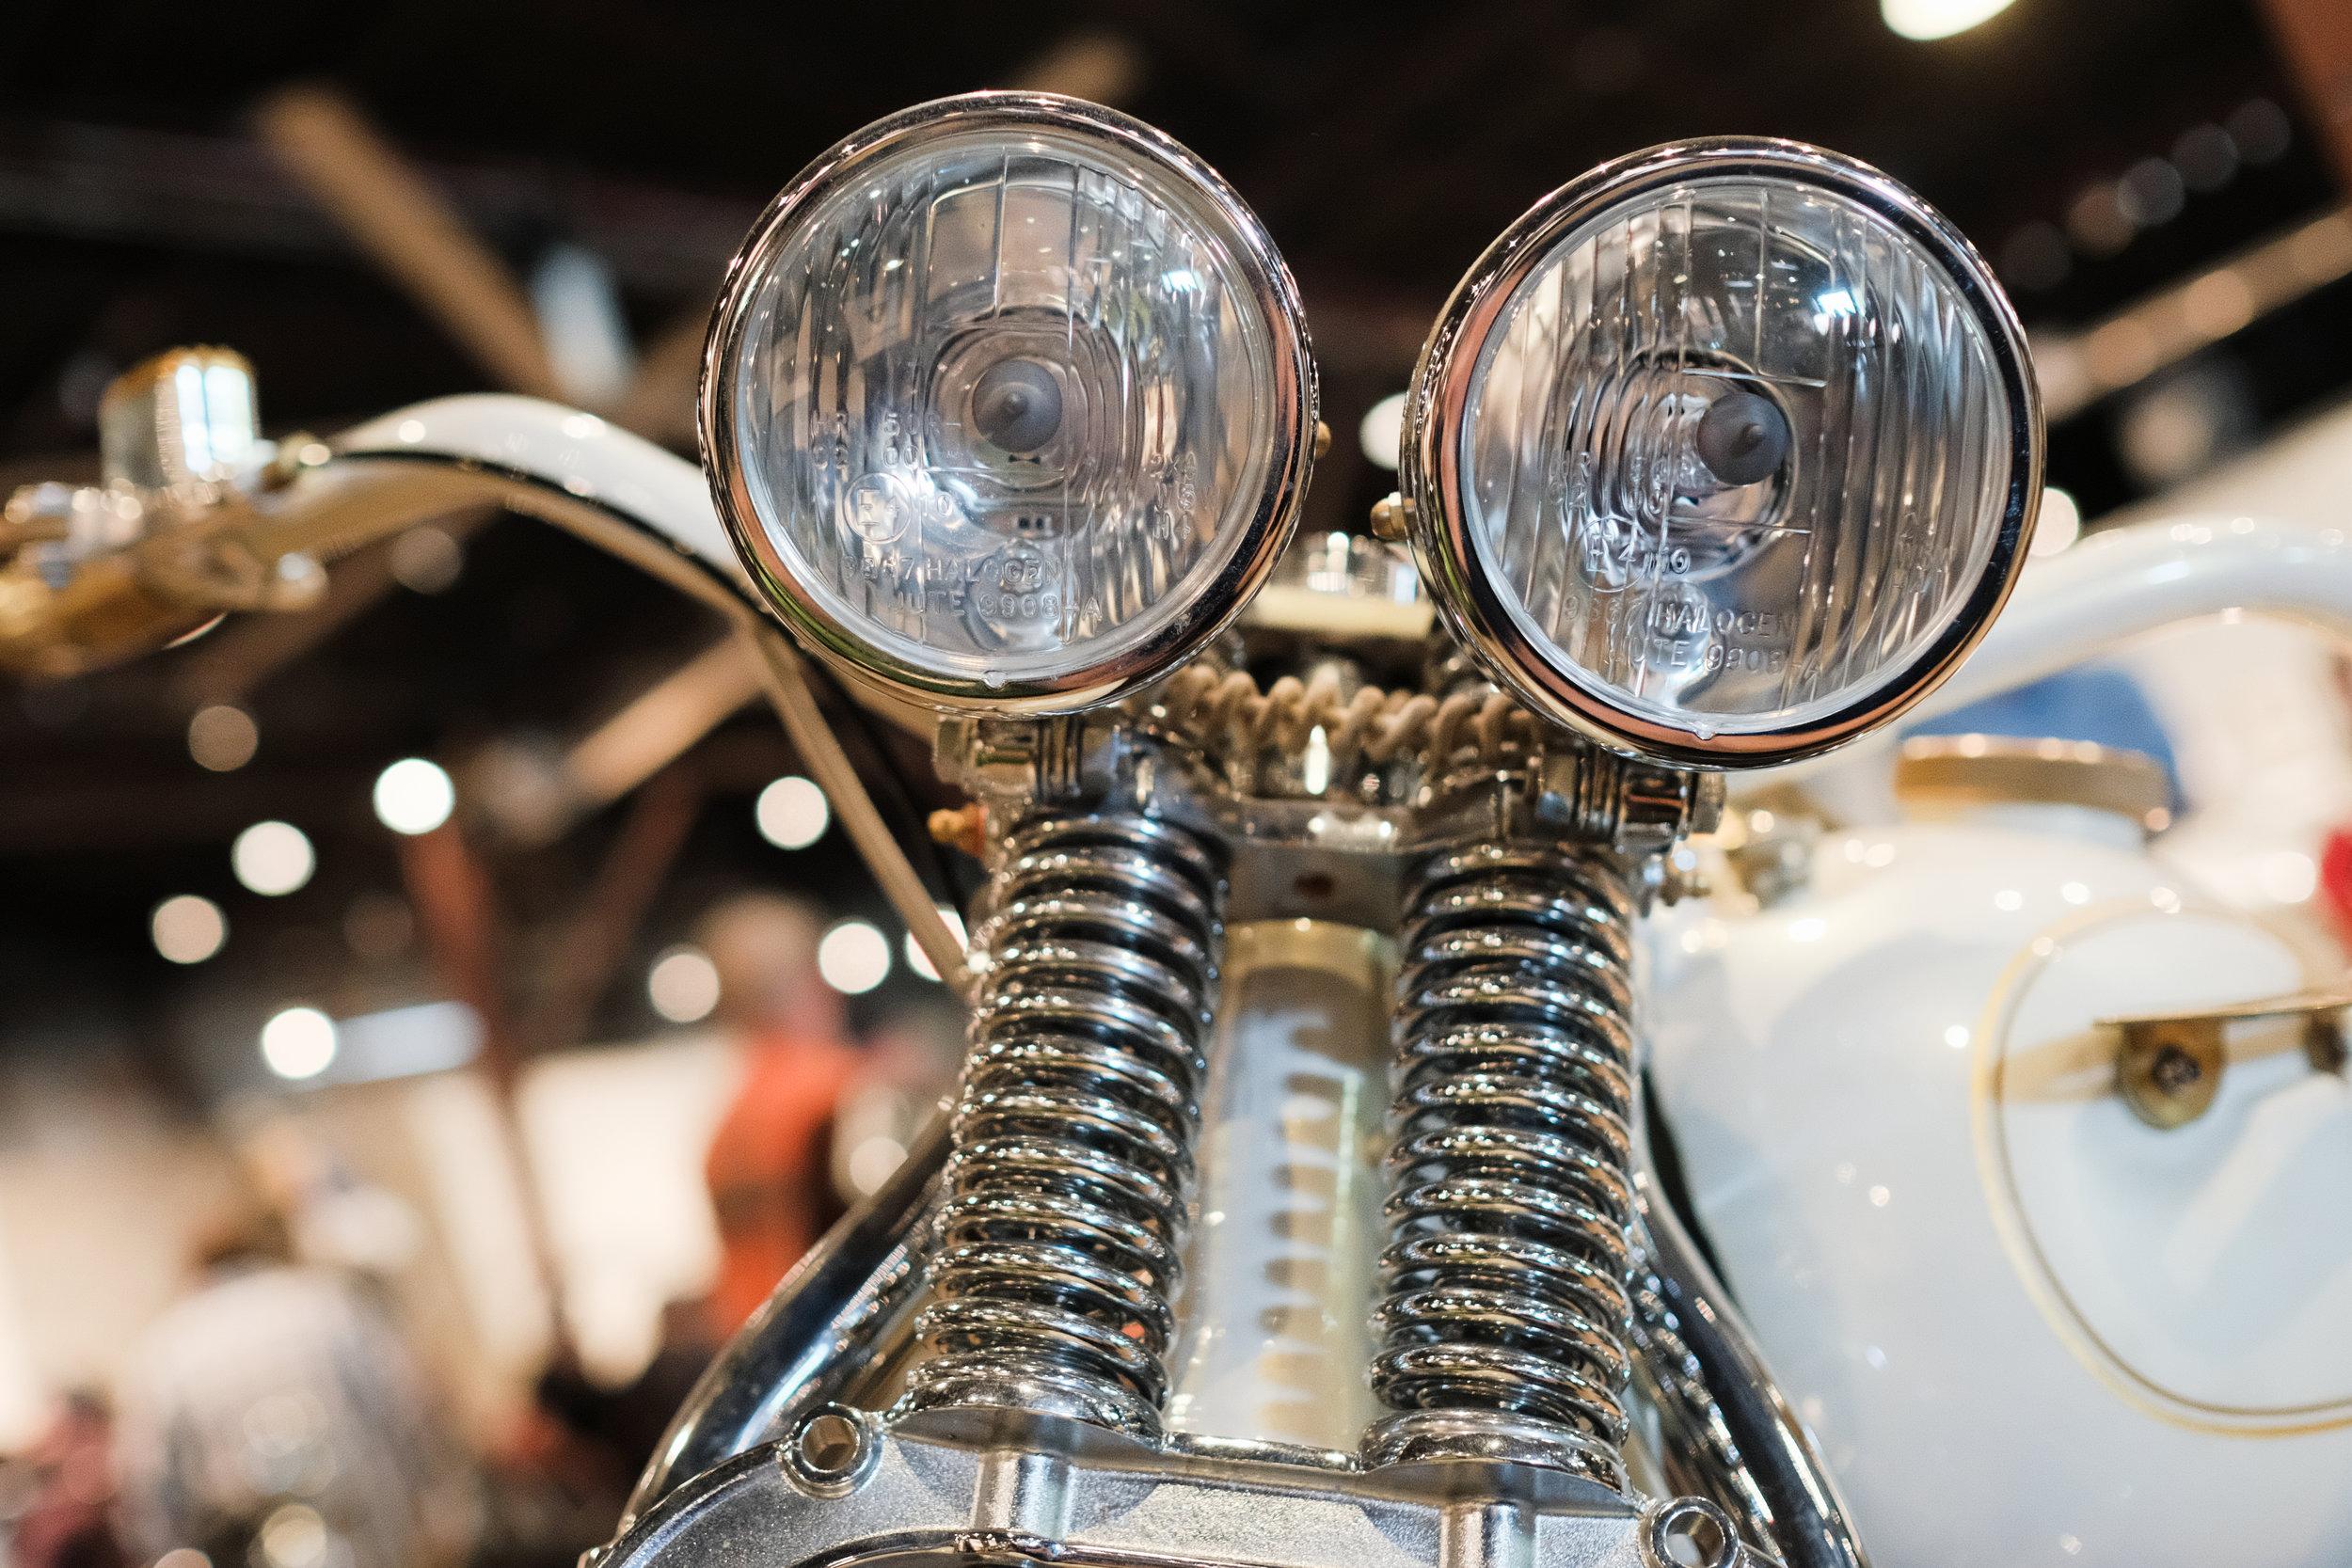 Handbuilt-Motorcycle-Show-2017-8735.jpg